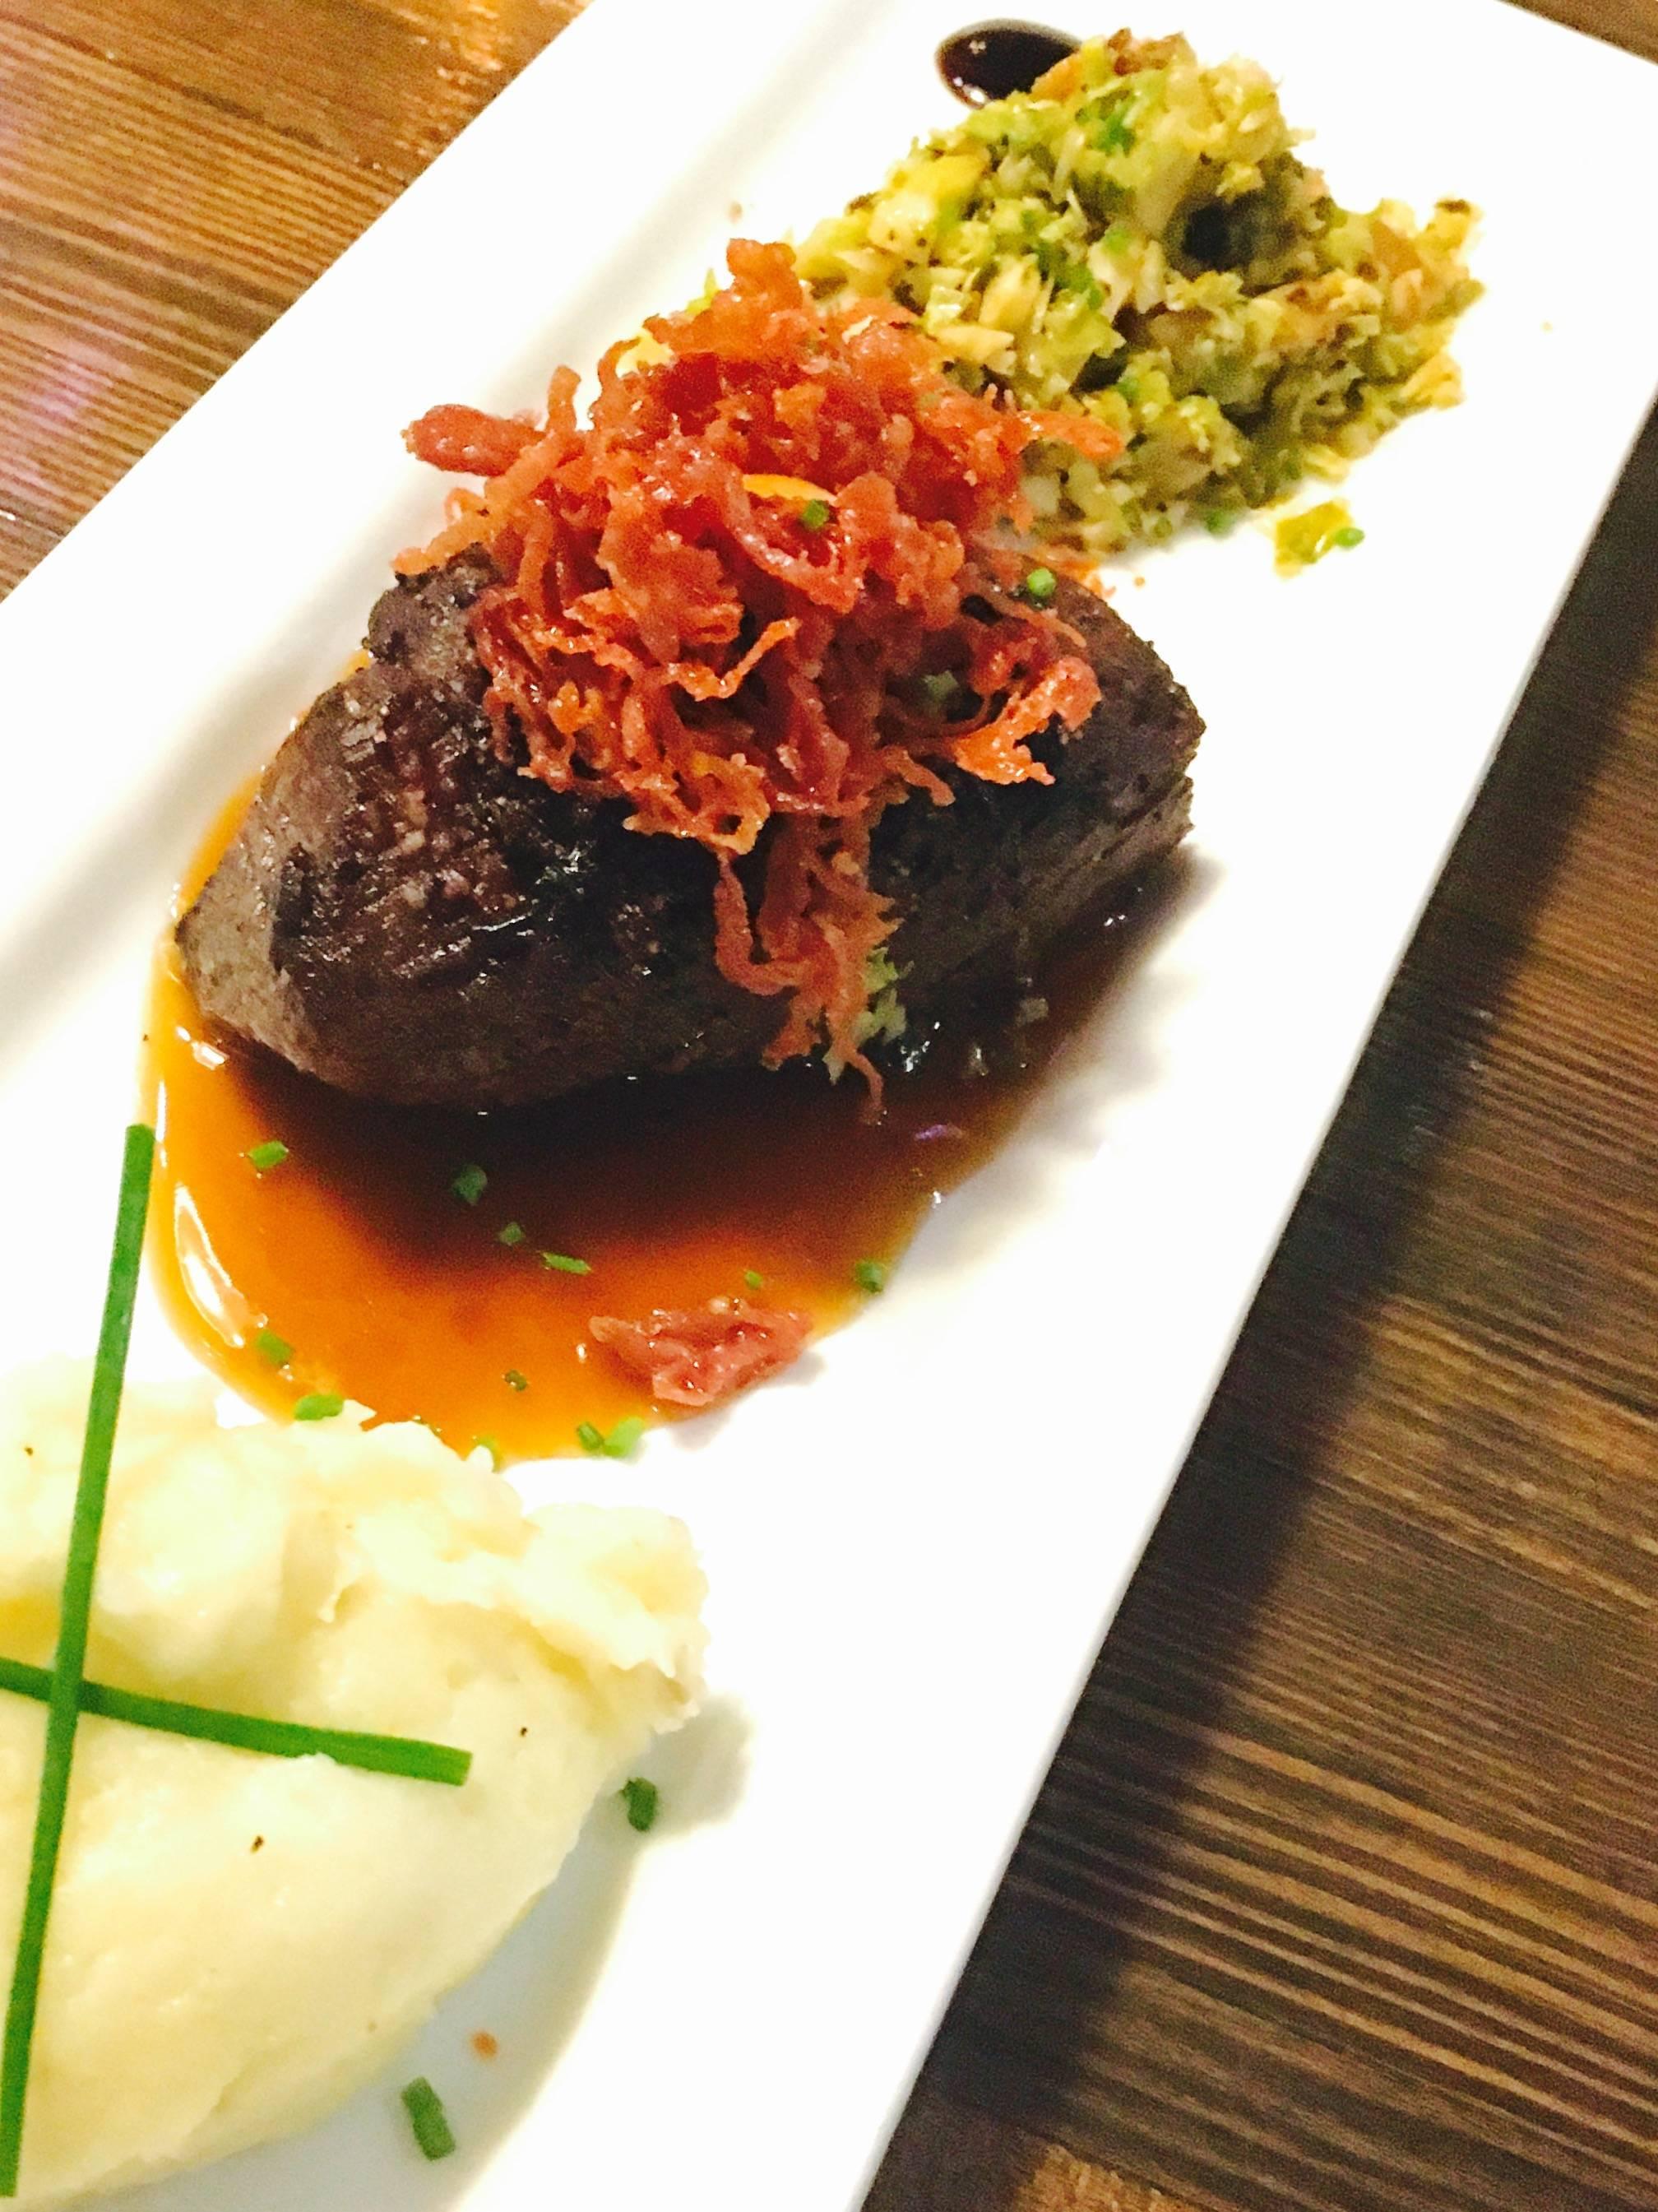 6516bc3285030088dd13_Steak.jpg